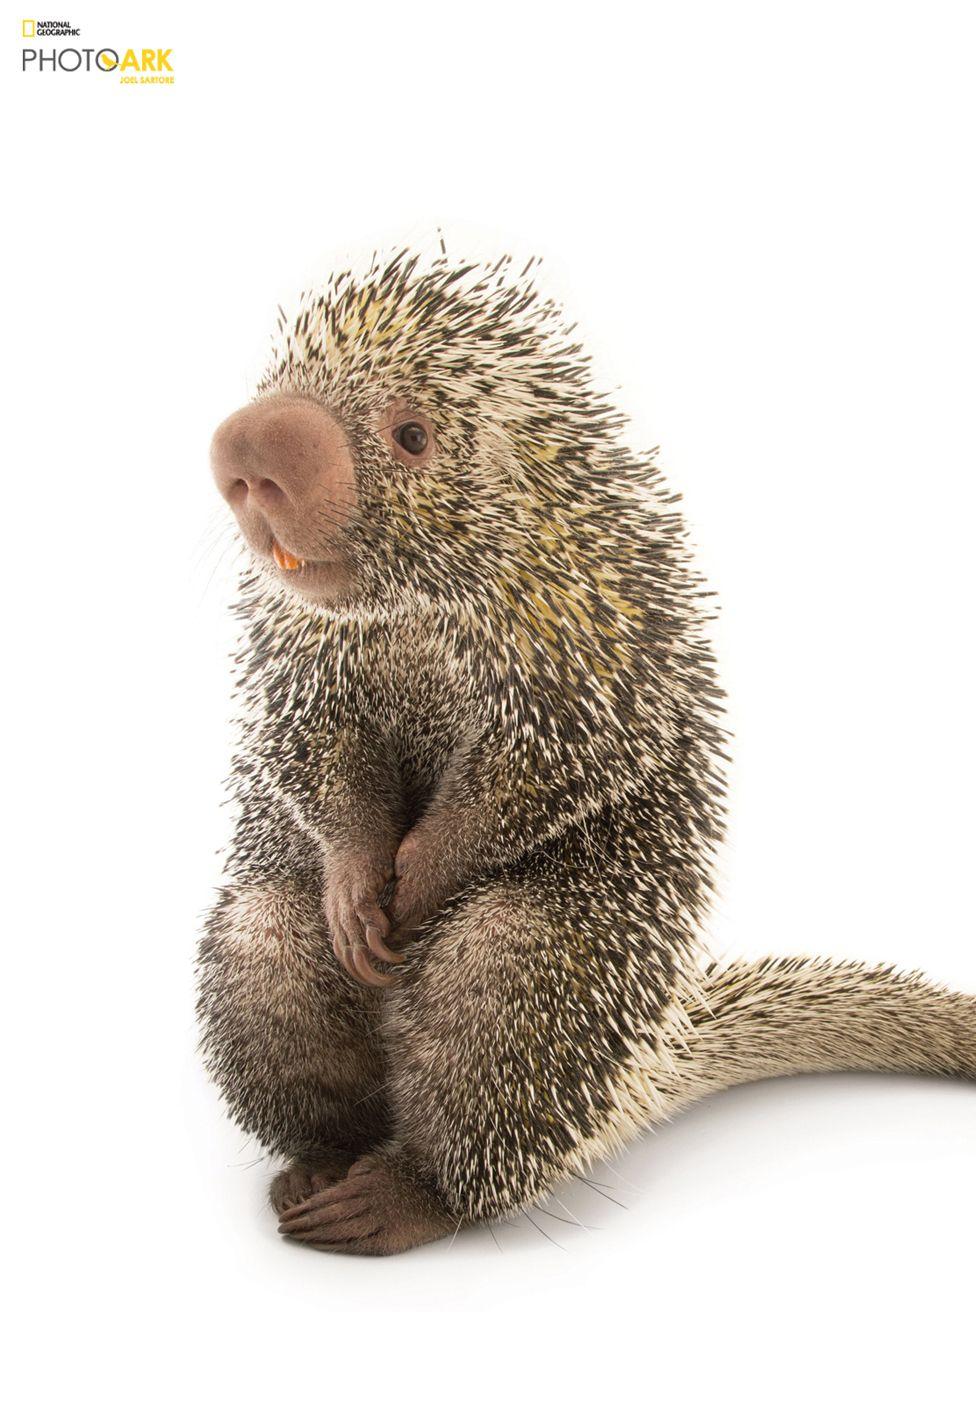 Image of: Plants Brazilian Porcupine coendou Prehensilis Saint Louis Zoo Missouri Ethical Marketing News Joel Sartore The Man Who Takes Studio Photos Of Endangered Species